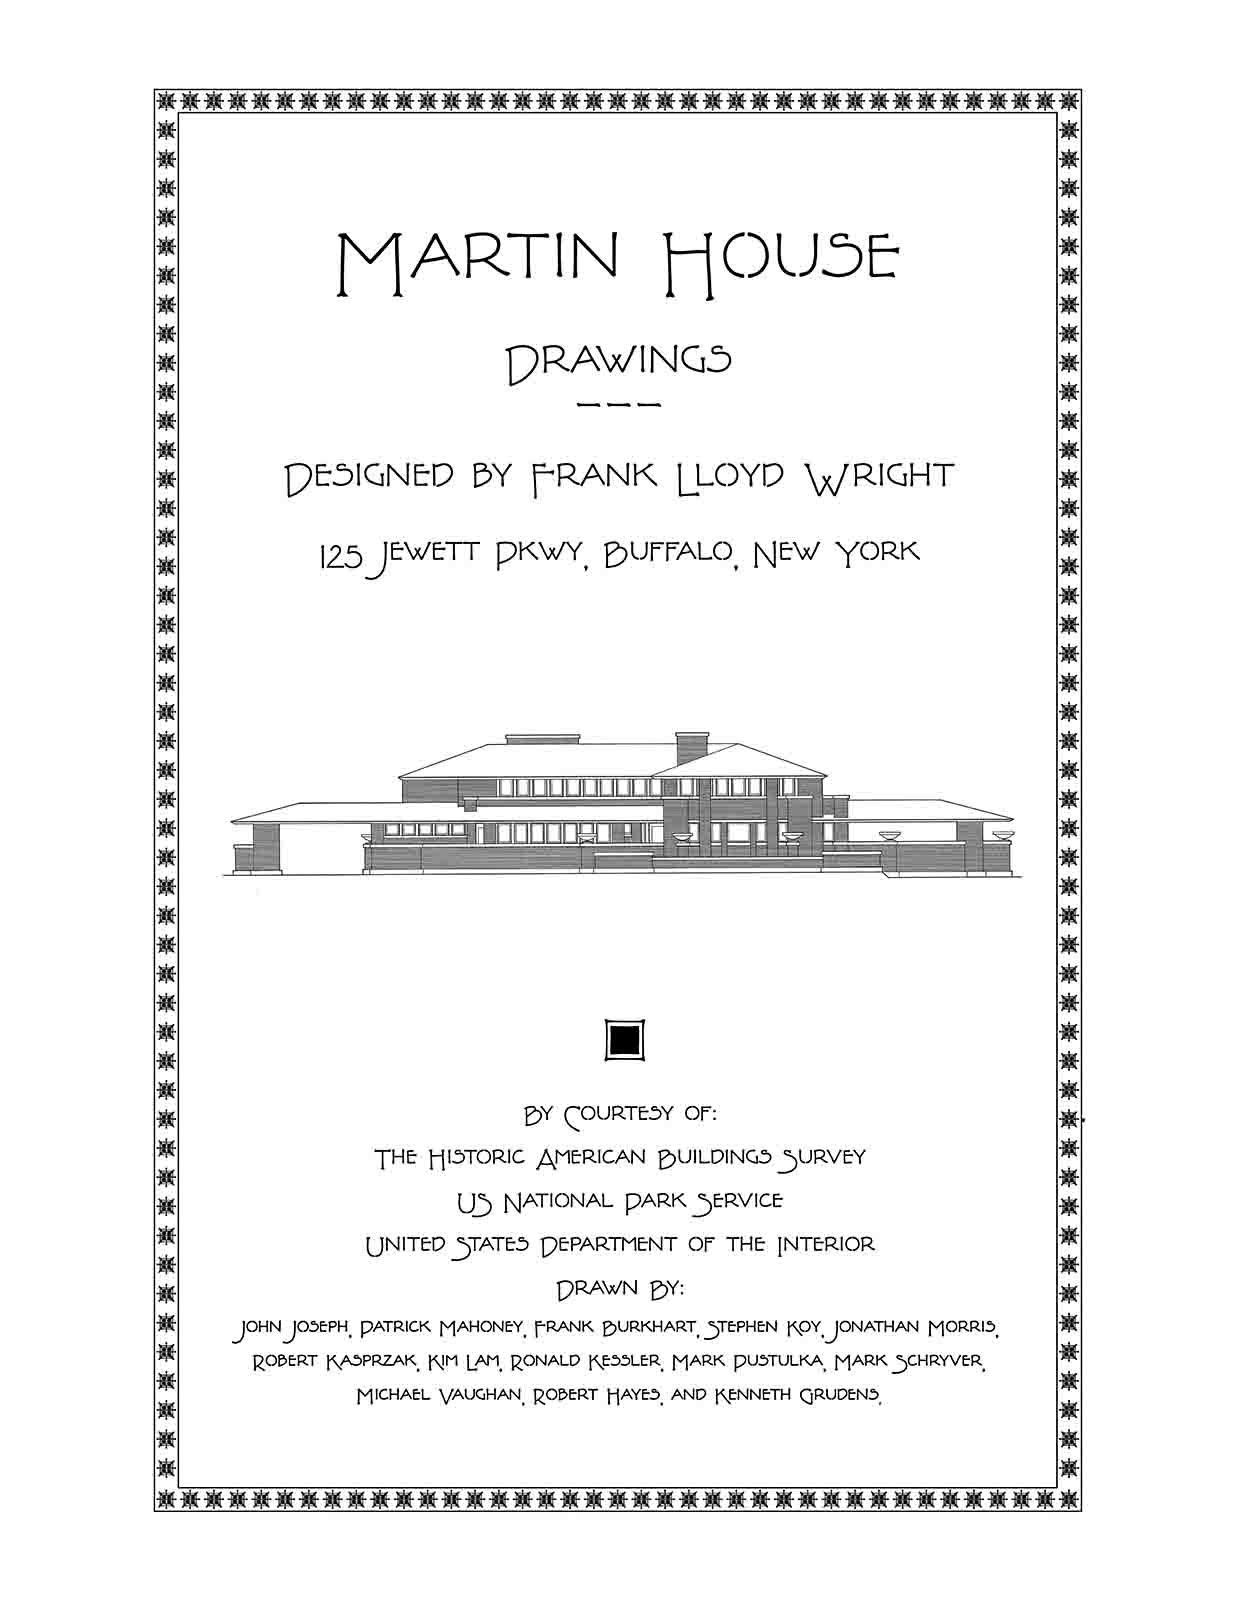 Martin House Drawings Designed By Frank Lloyd Wright J Randal Jewett Wiring Diagram Wilkerson 9781926517186 Books